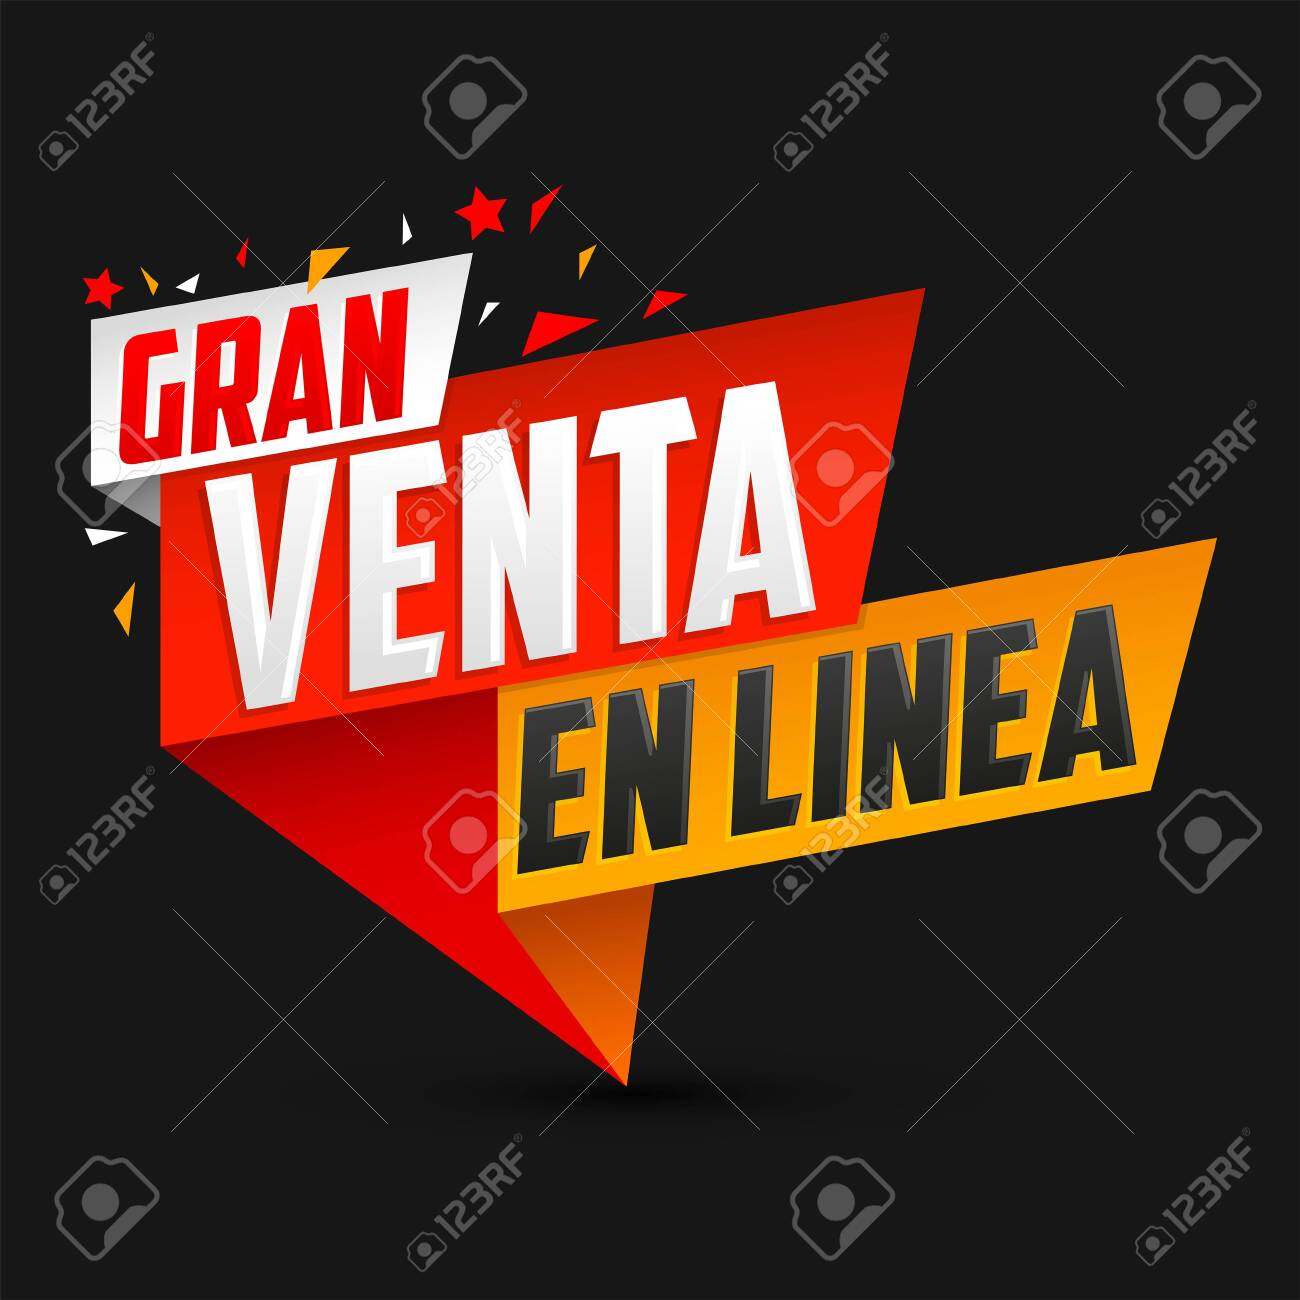 Gran Venta en Linea, Great Online Sale Spanish text, vector design. - 150606508